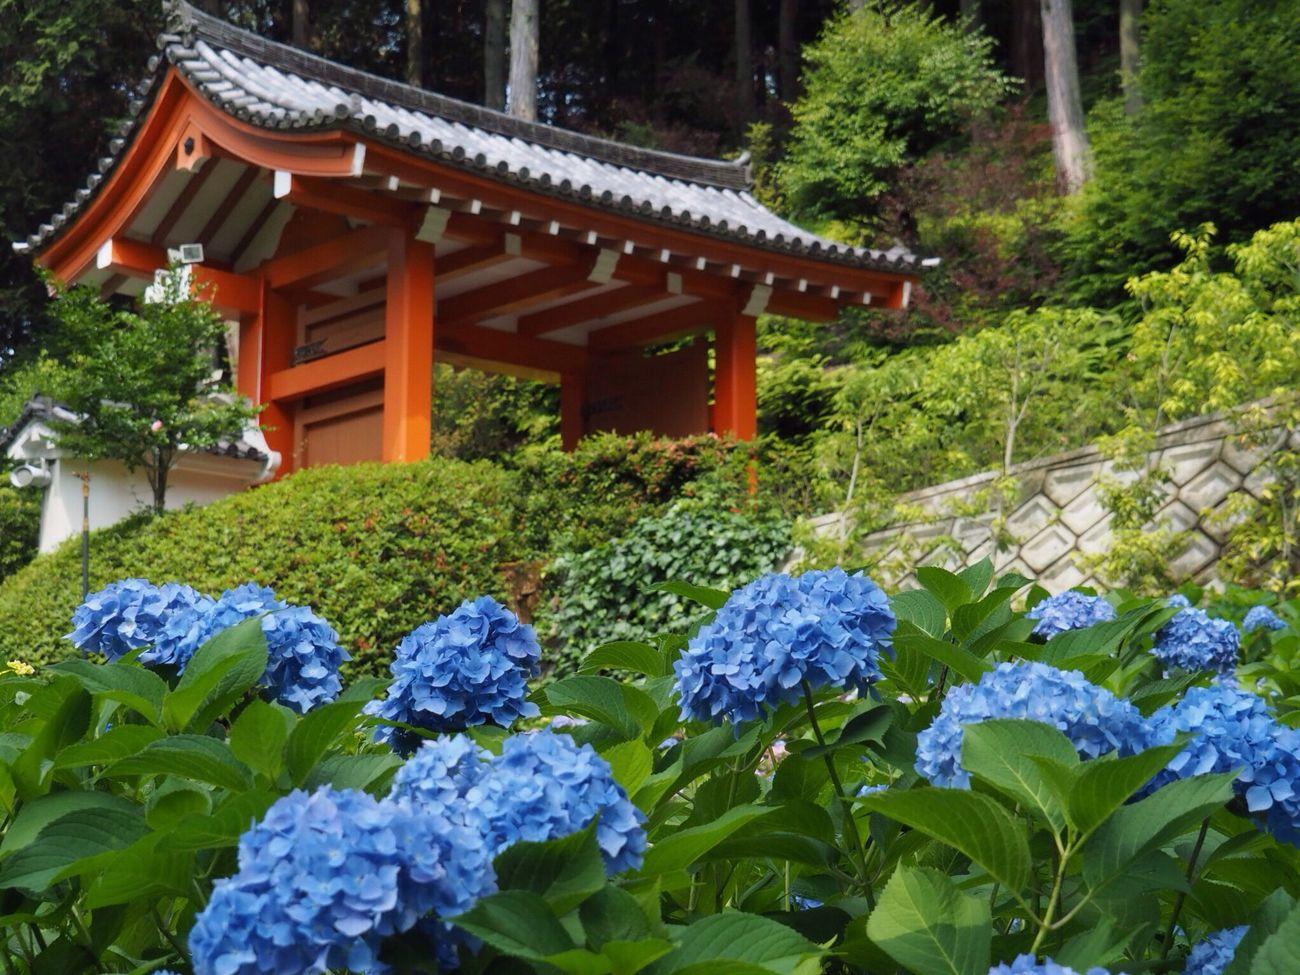 Kyoto Japan Uji Mimurotoji Temple Gate Hydrangea Flowers Plant Beauty In Nature Outdoors Day Blue Beauty Olympus PEN-F 京都 日本 宇治 三室戸寺 紫陽花